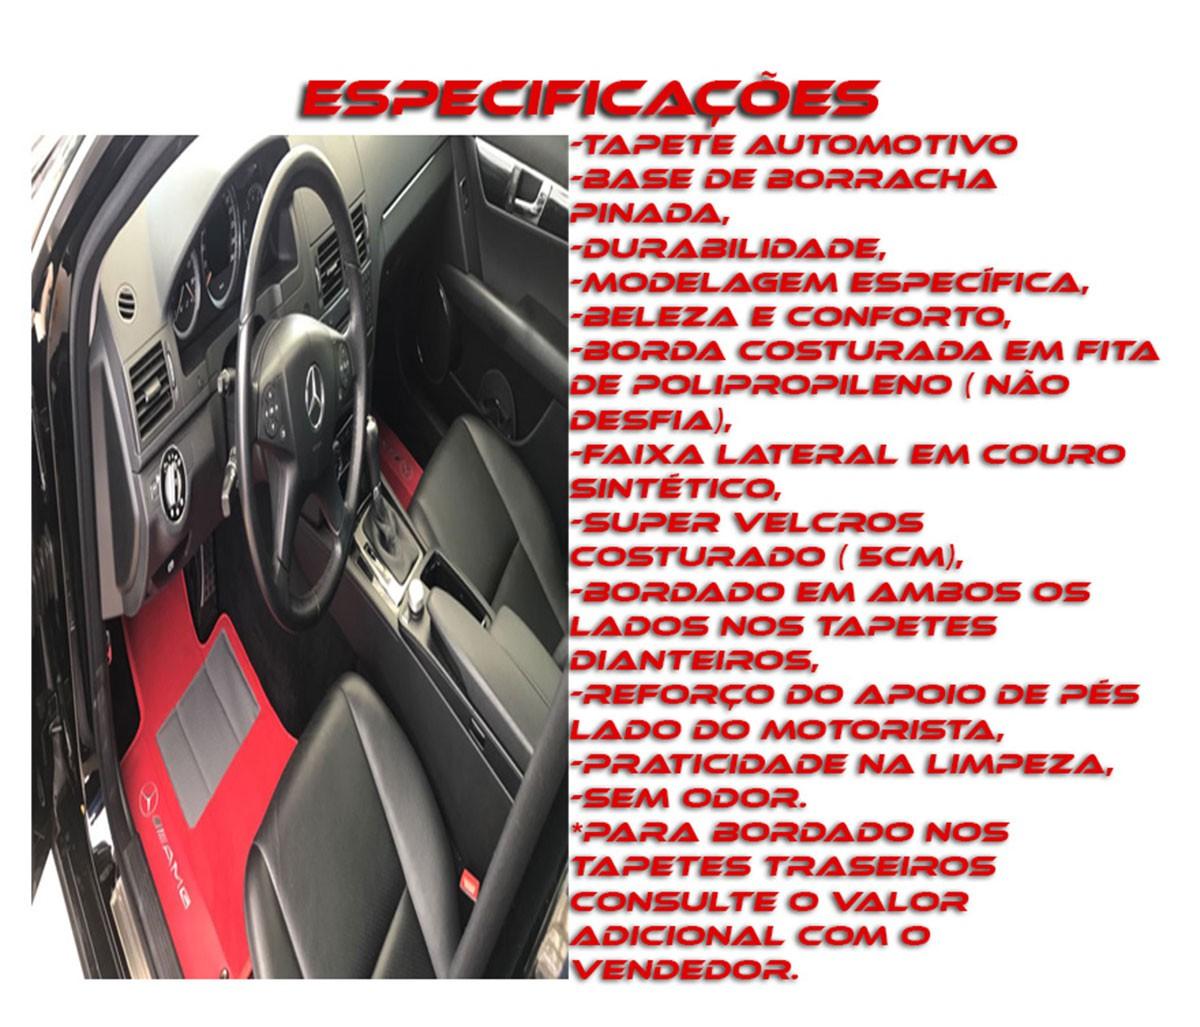 Kit Tapete+Porta Malas+Estepe Volkswagen Fusca Luxo Base Pinada